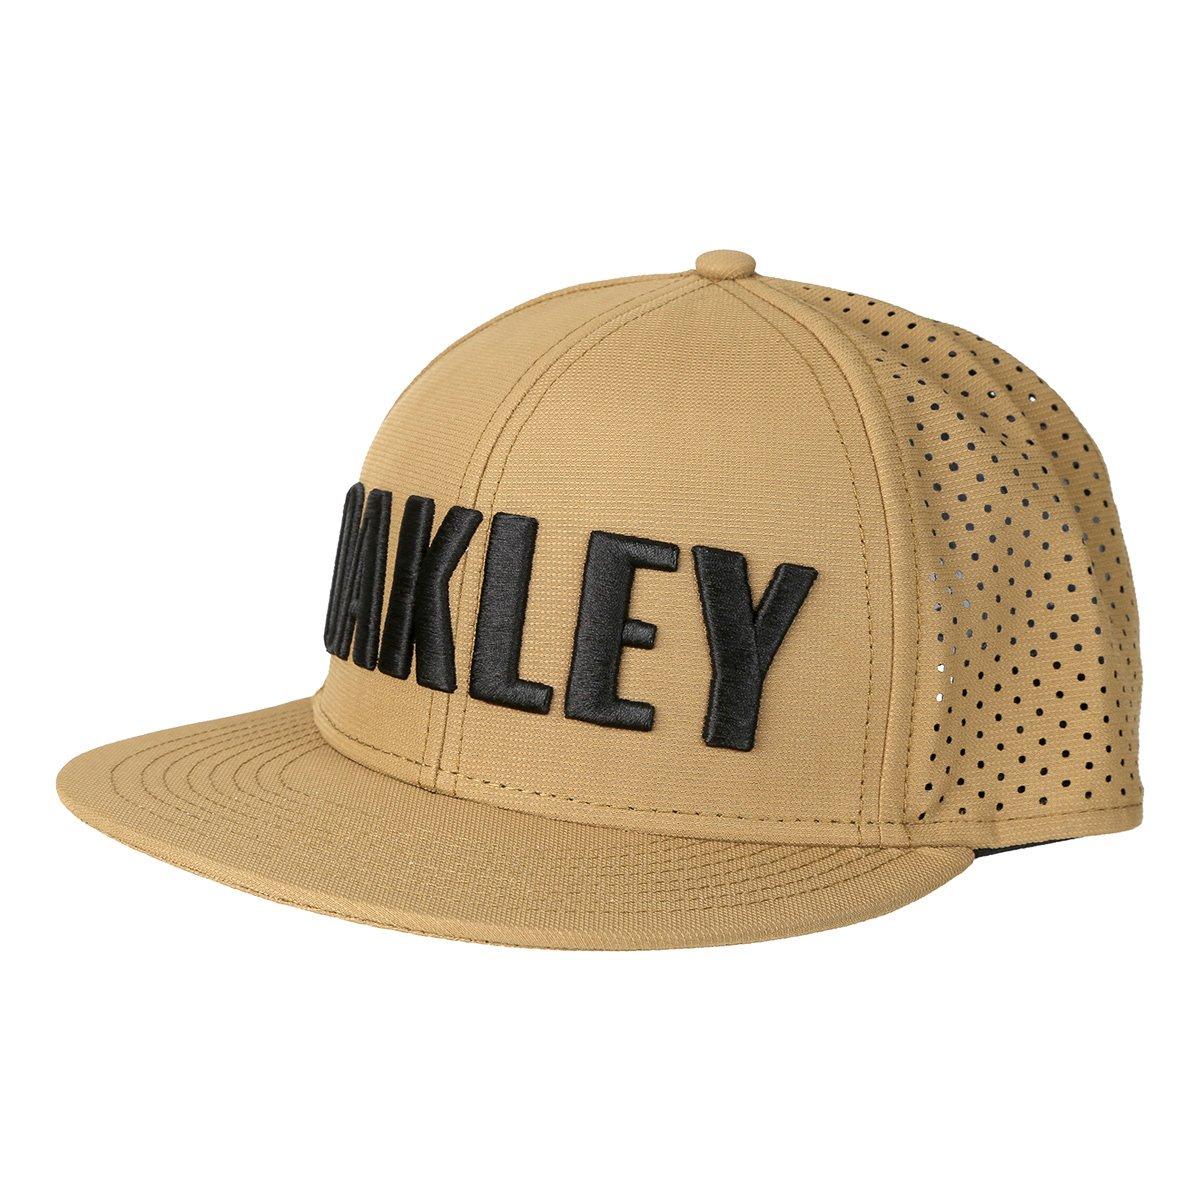 Boné Oakley Aba Reta Mod Perf Hat Masculino - Compre Agora  313a8b9ab590f